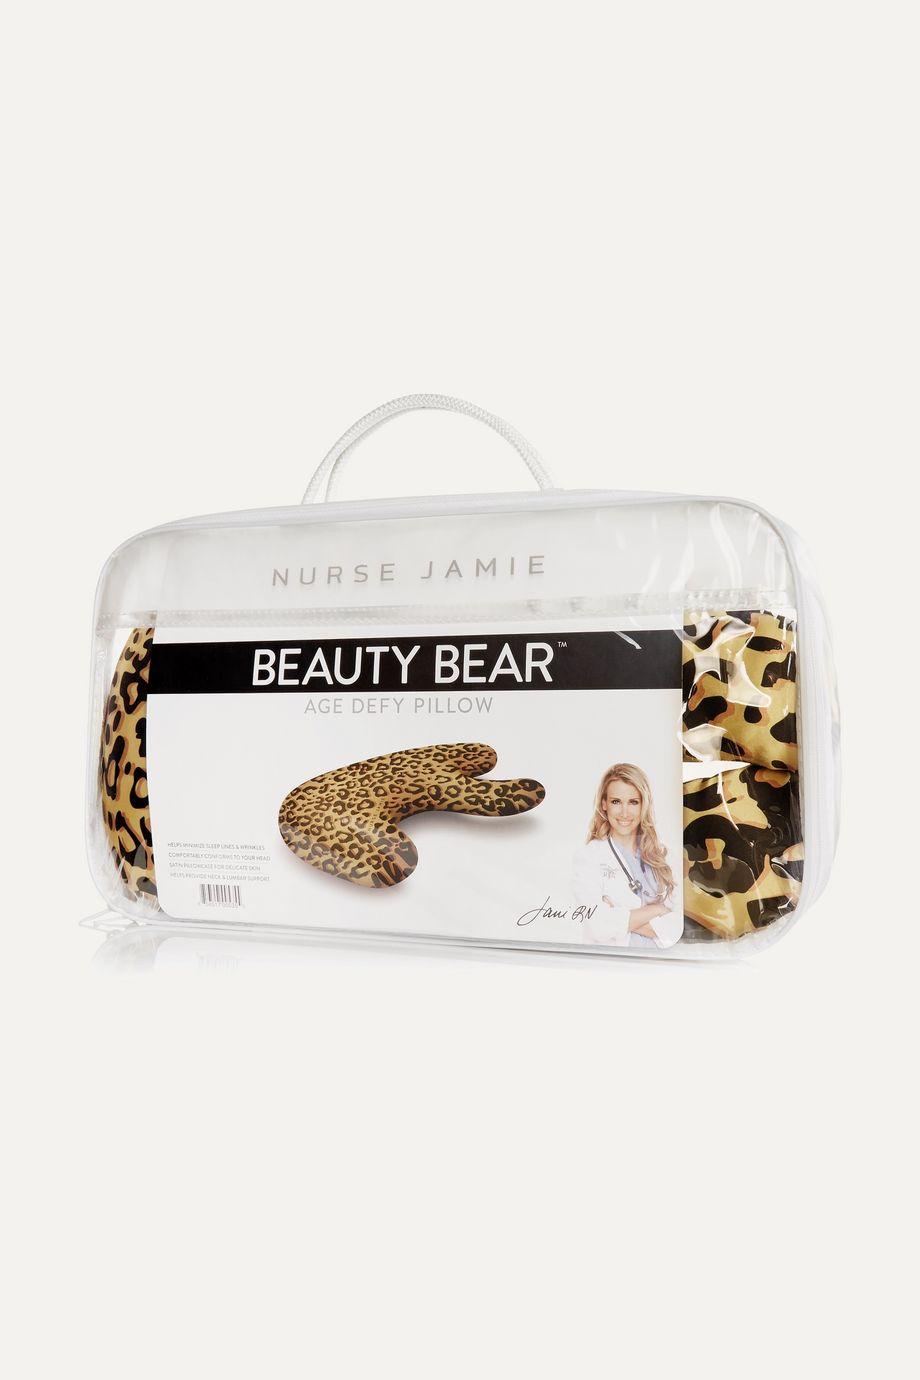 Nurse Jamie Beauty Bear™ Age Defy Pillow - Leopard